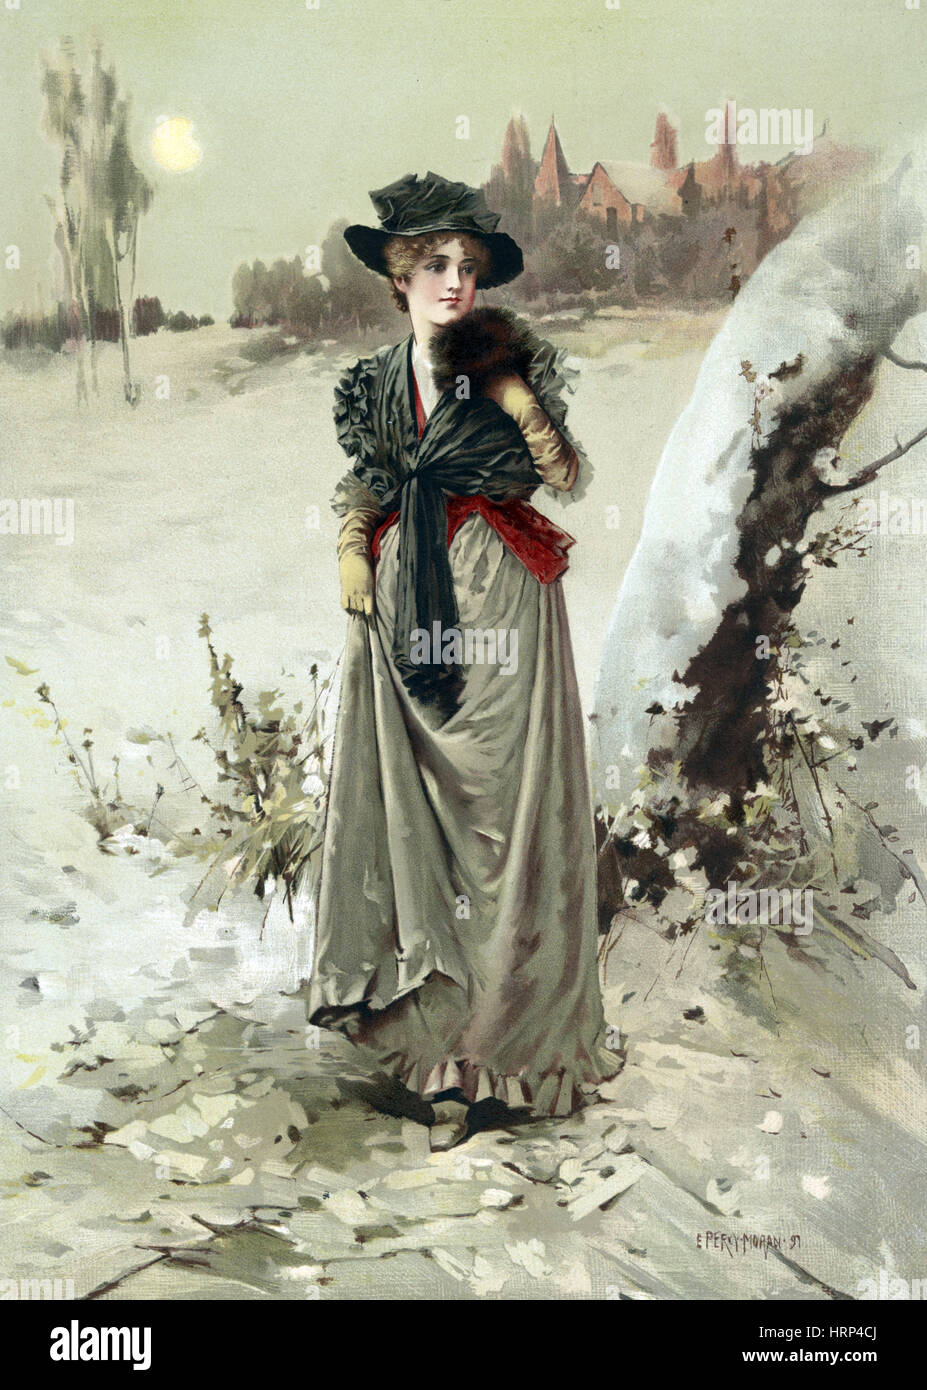 Season's Greetings, Happy Holidays, 1895 - Stock Image